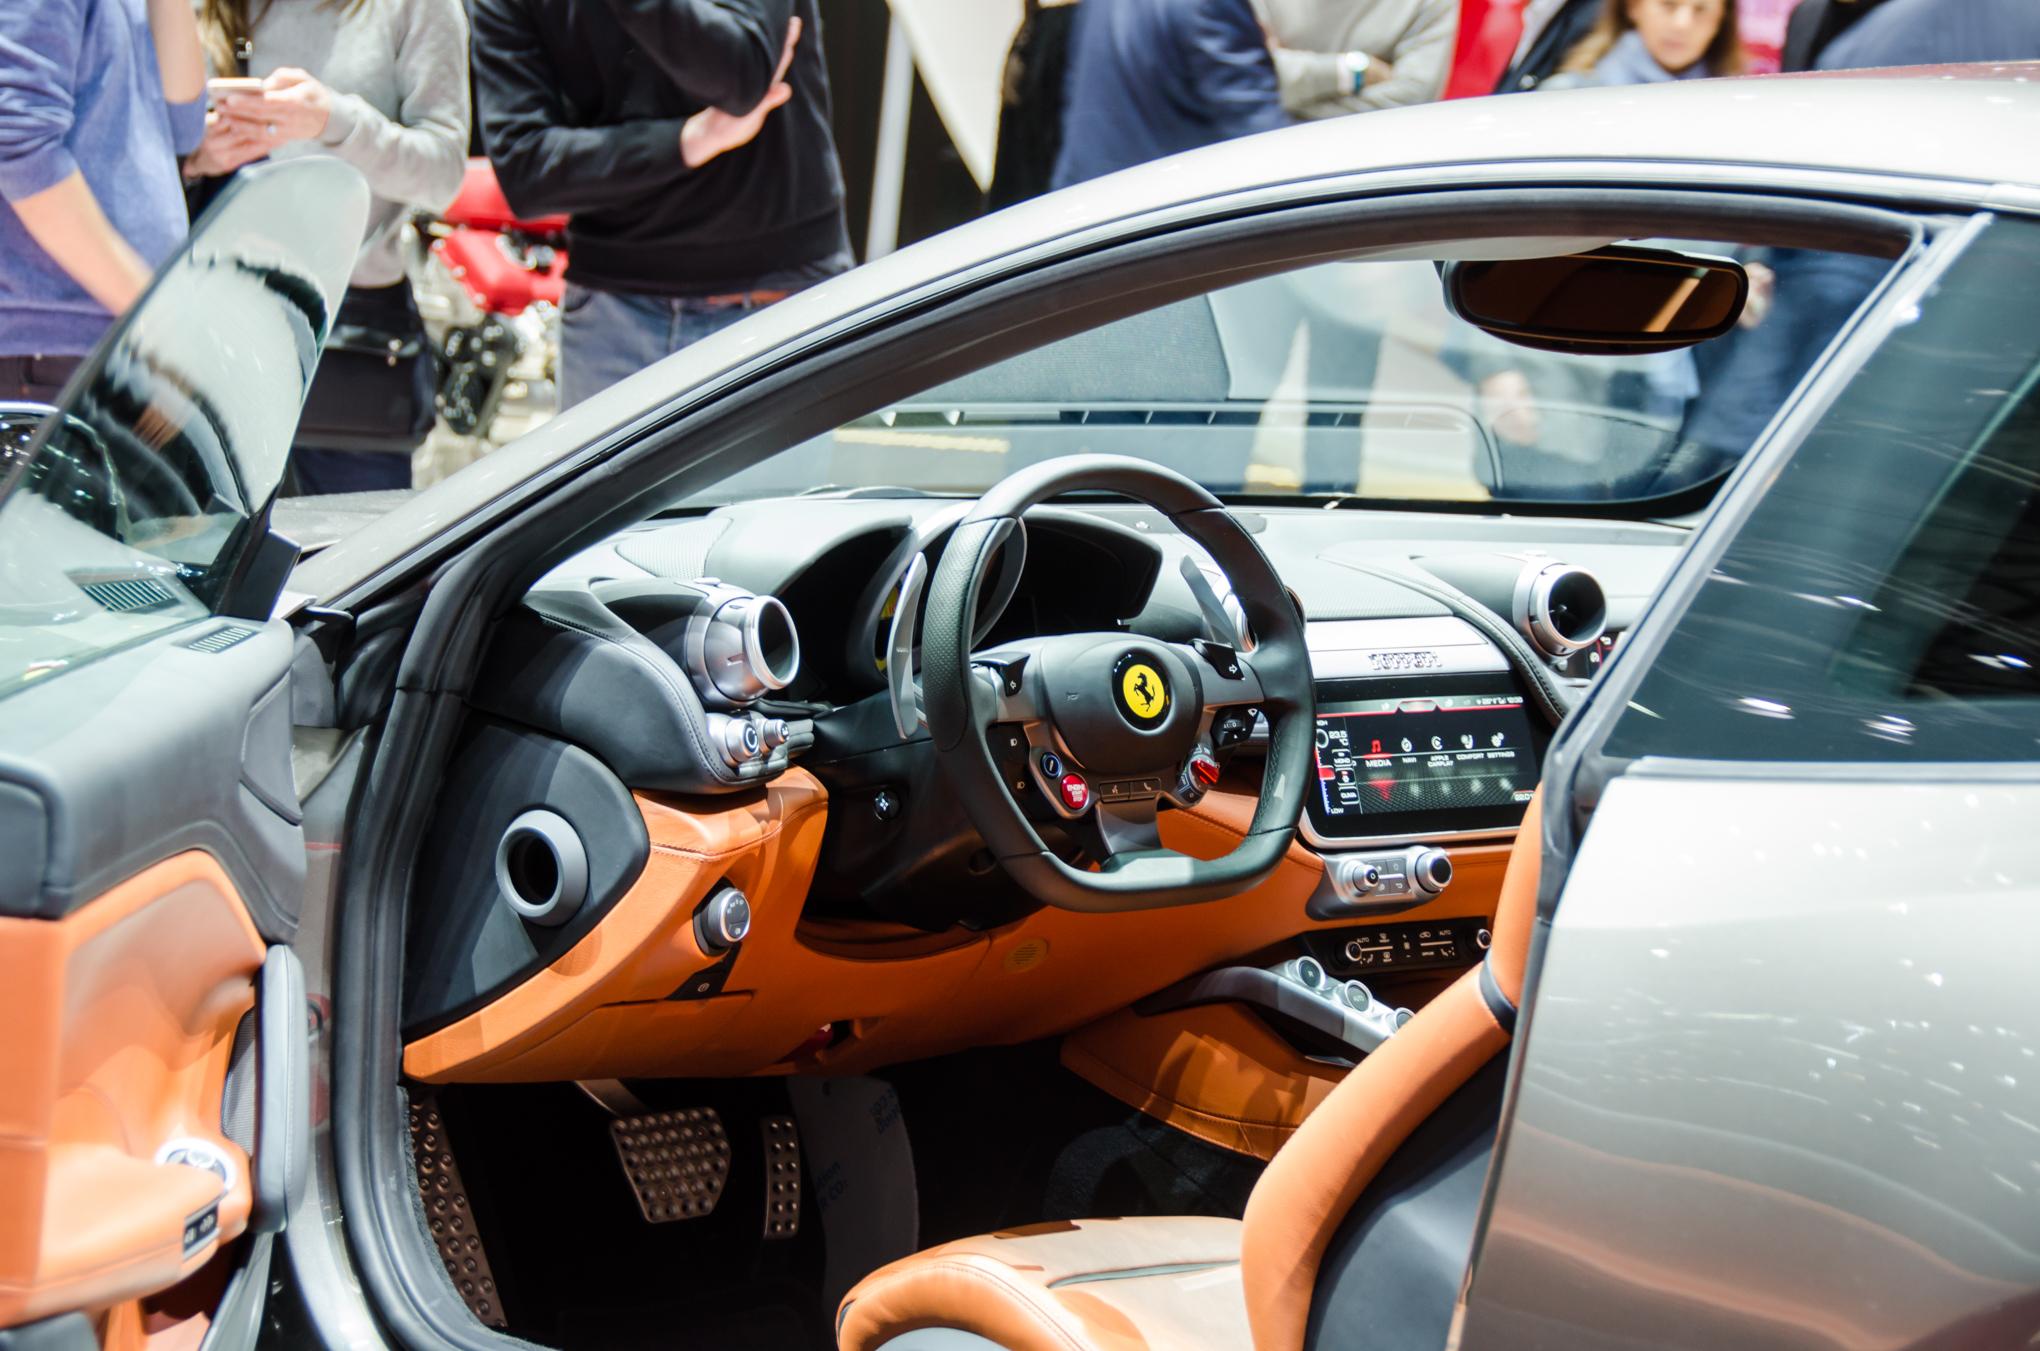 2017 Ferrari Gtc4lusso Gains Power Interior Upgrades Over Ff